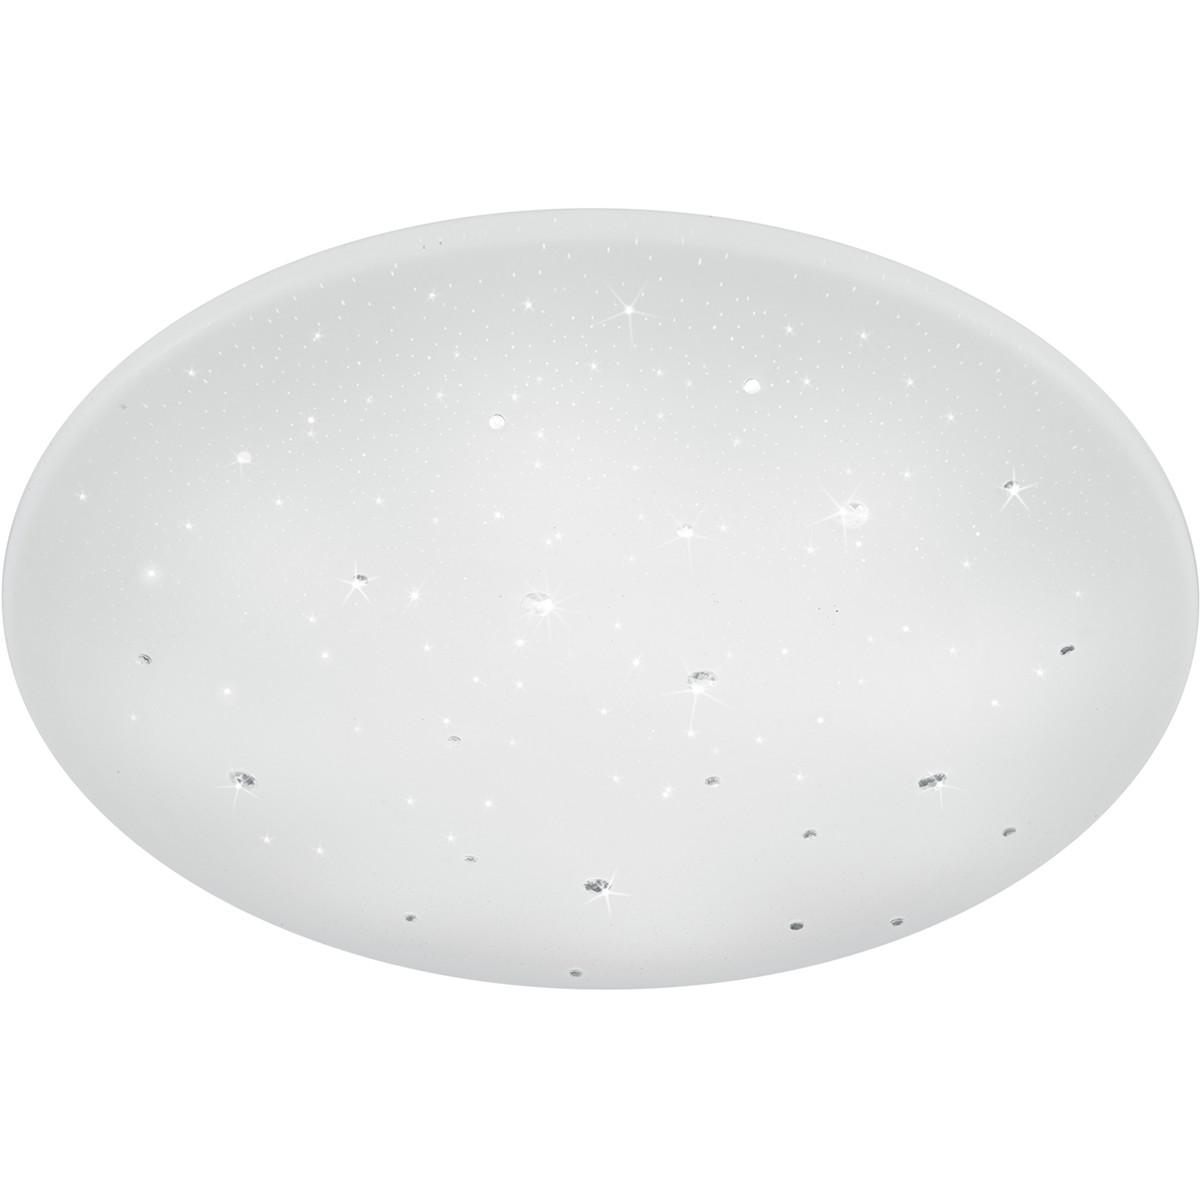 LED Plafondlamp - Trion Acinoa - 40W - Aanpasbare Kleur - Dimbaar - Afstandsbediening - Rond - Mat W